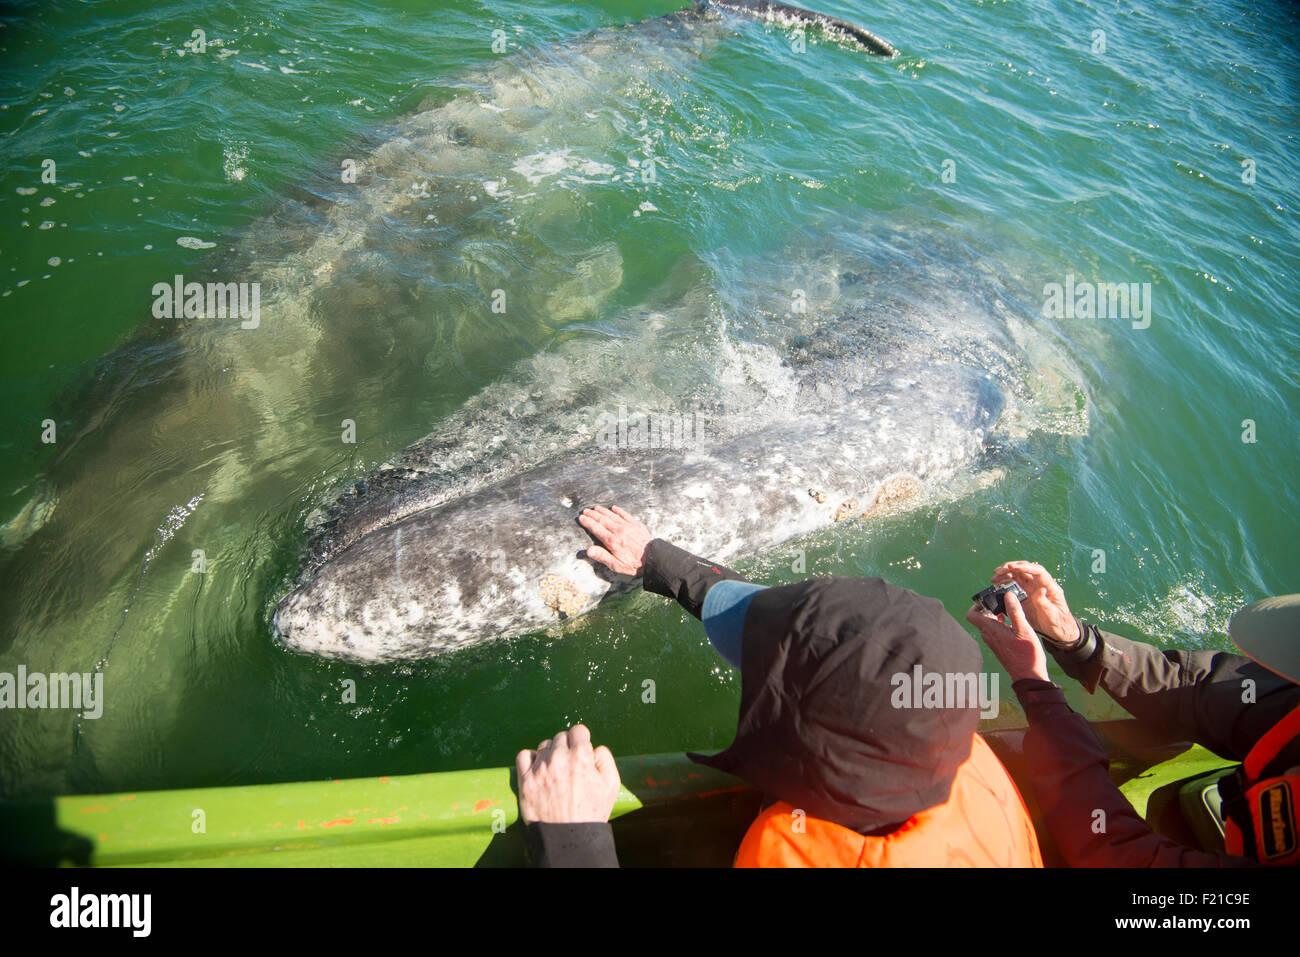 Mexico. San Ignacio Lagoon. Tourists interacting with whales. - Stock Image